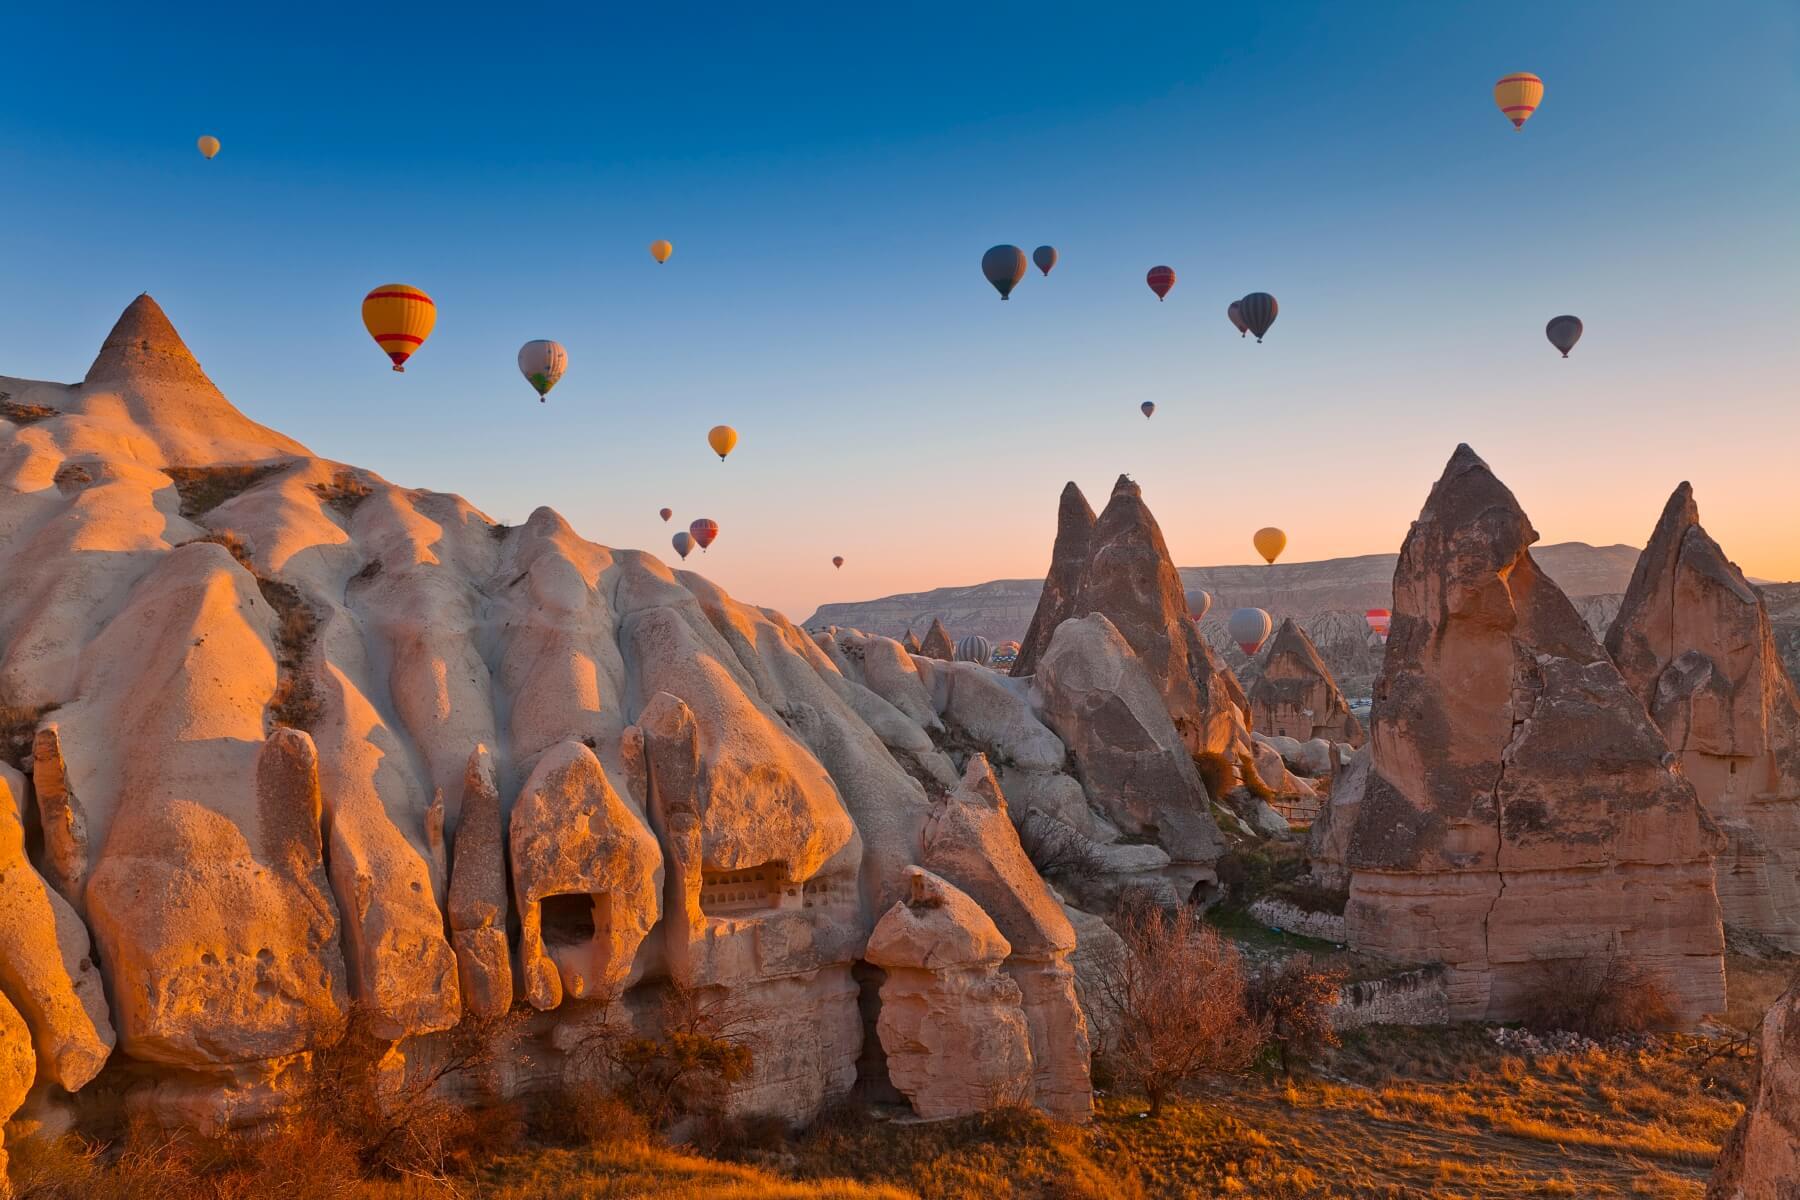 Ballonfahrten über Kappadokien